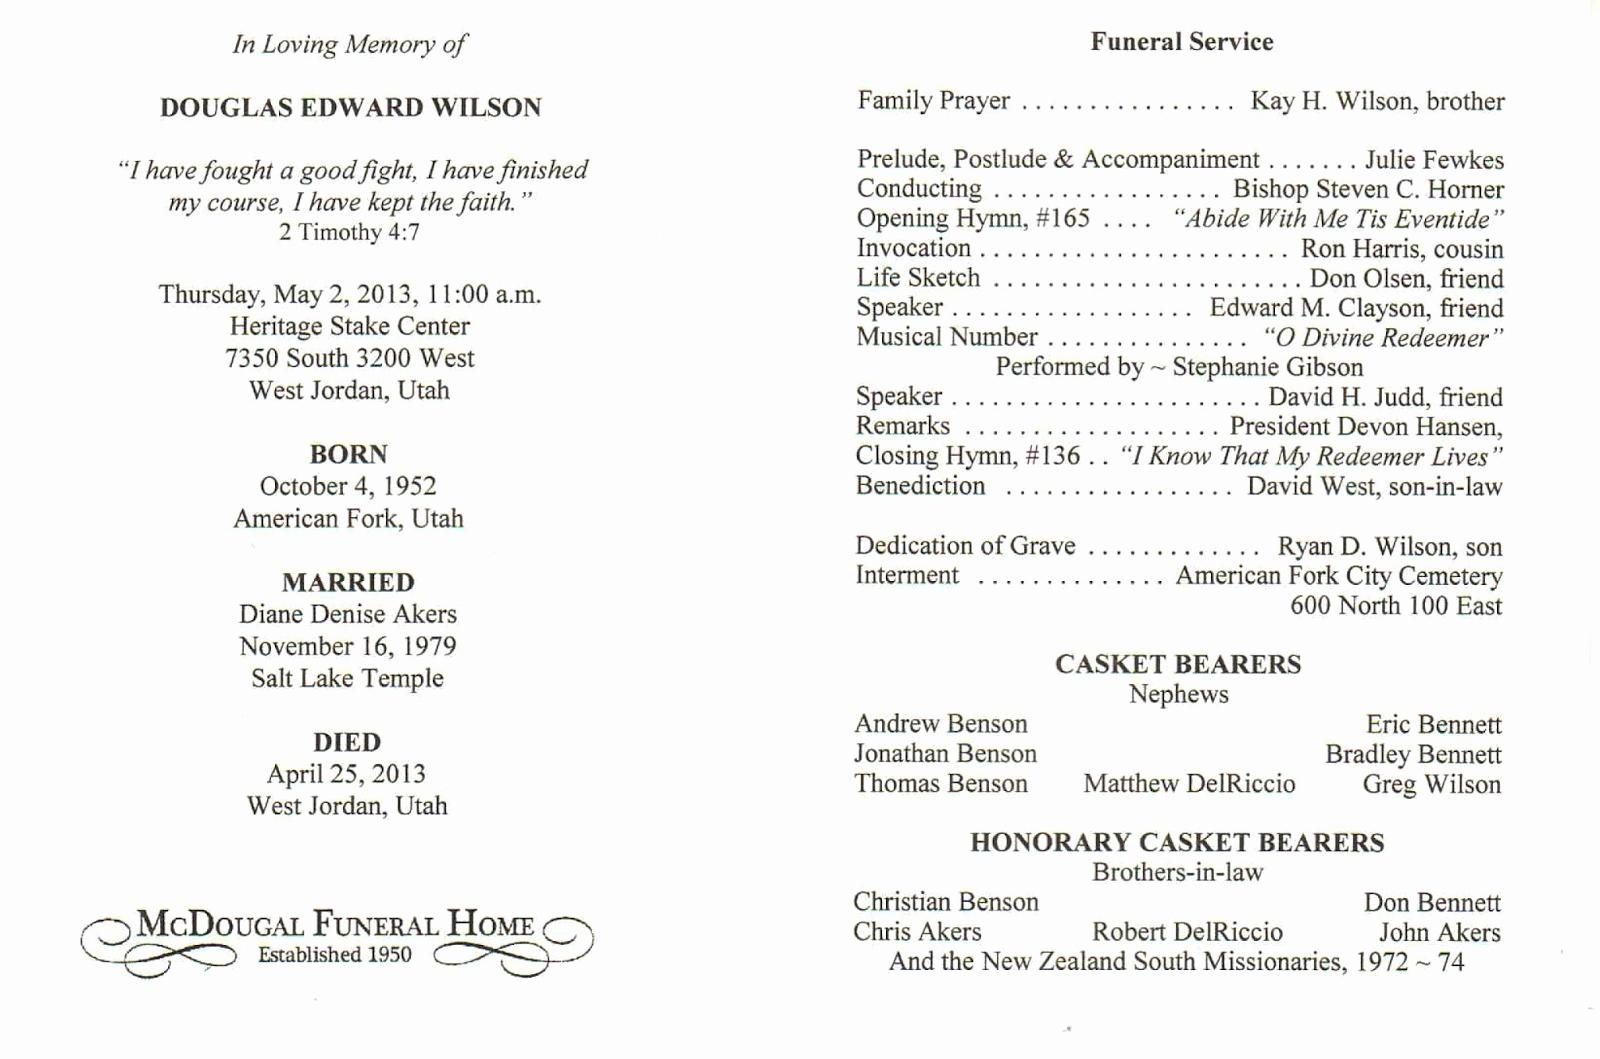 Catholic Funeral Mass Program Luxury Doug Wilson S Latest Funeral Recording and Program